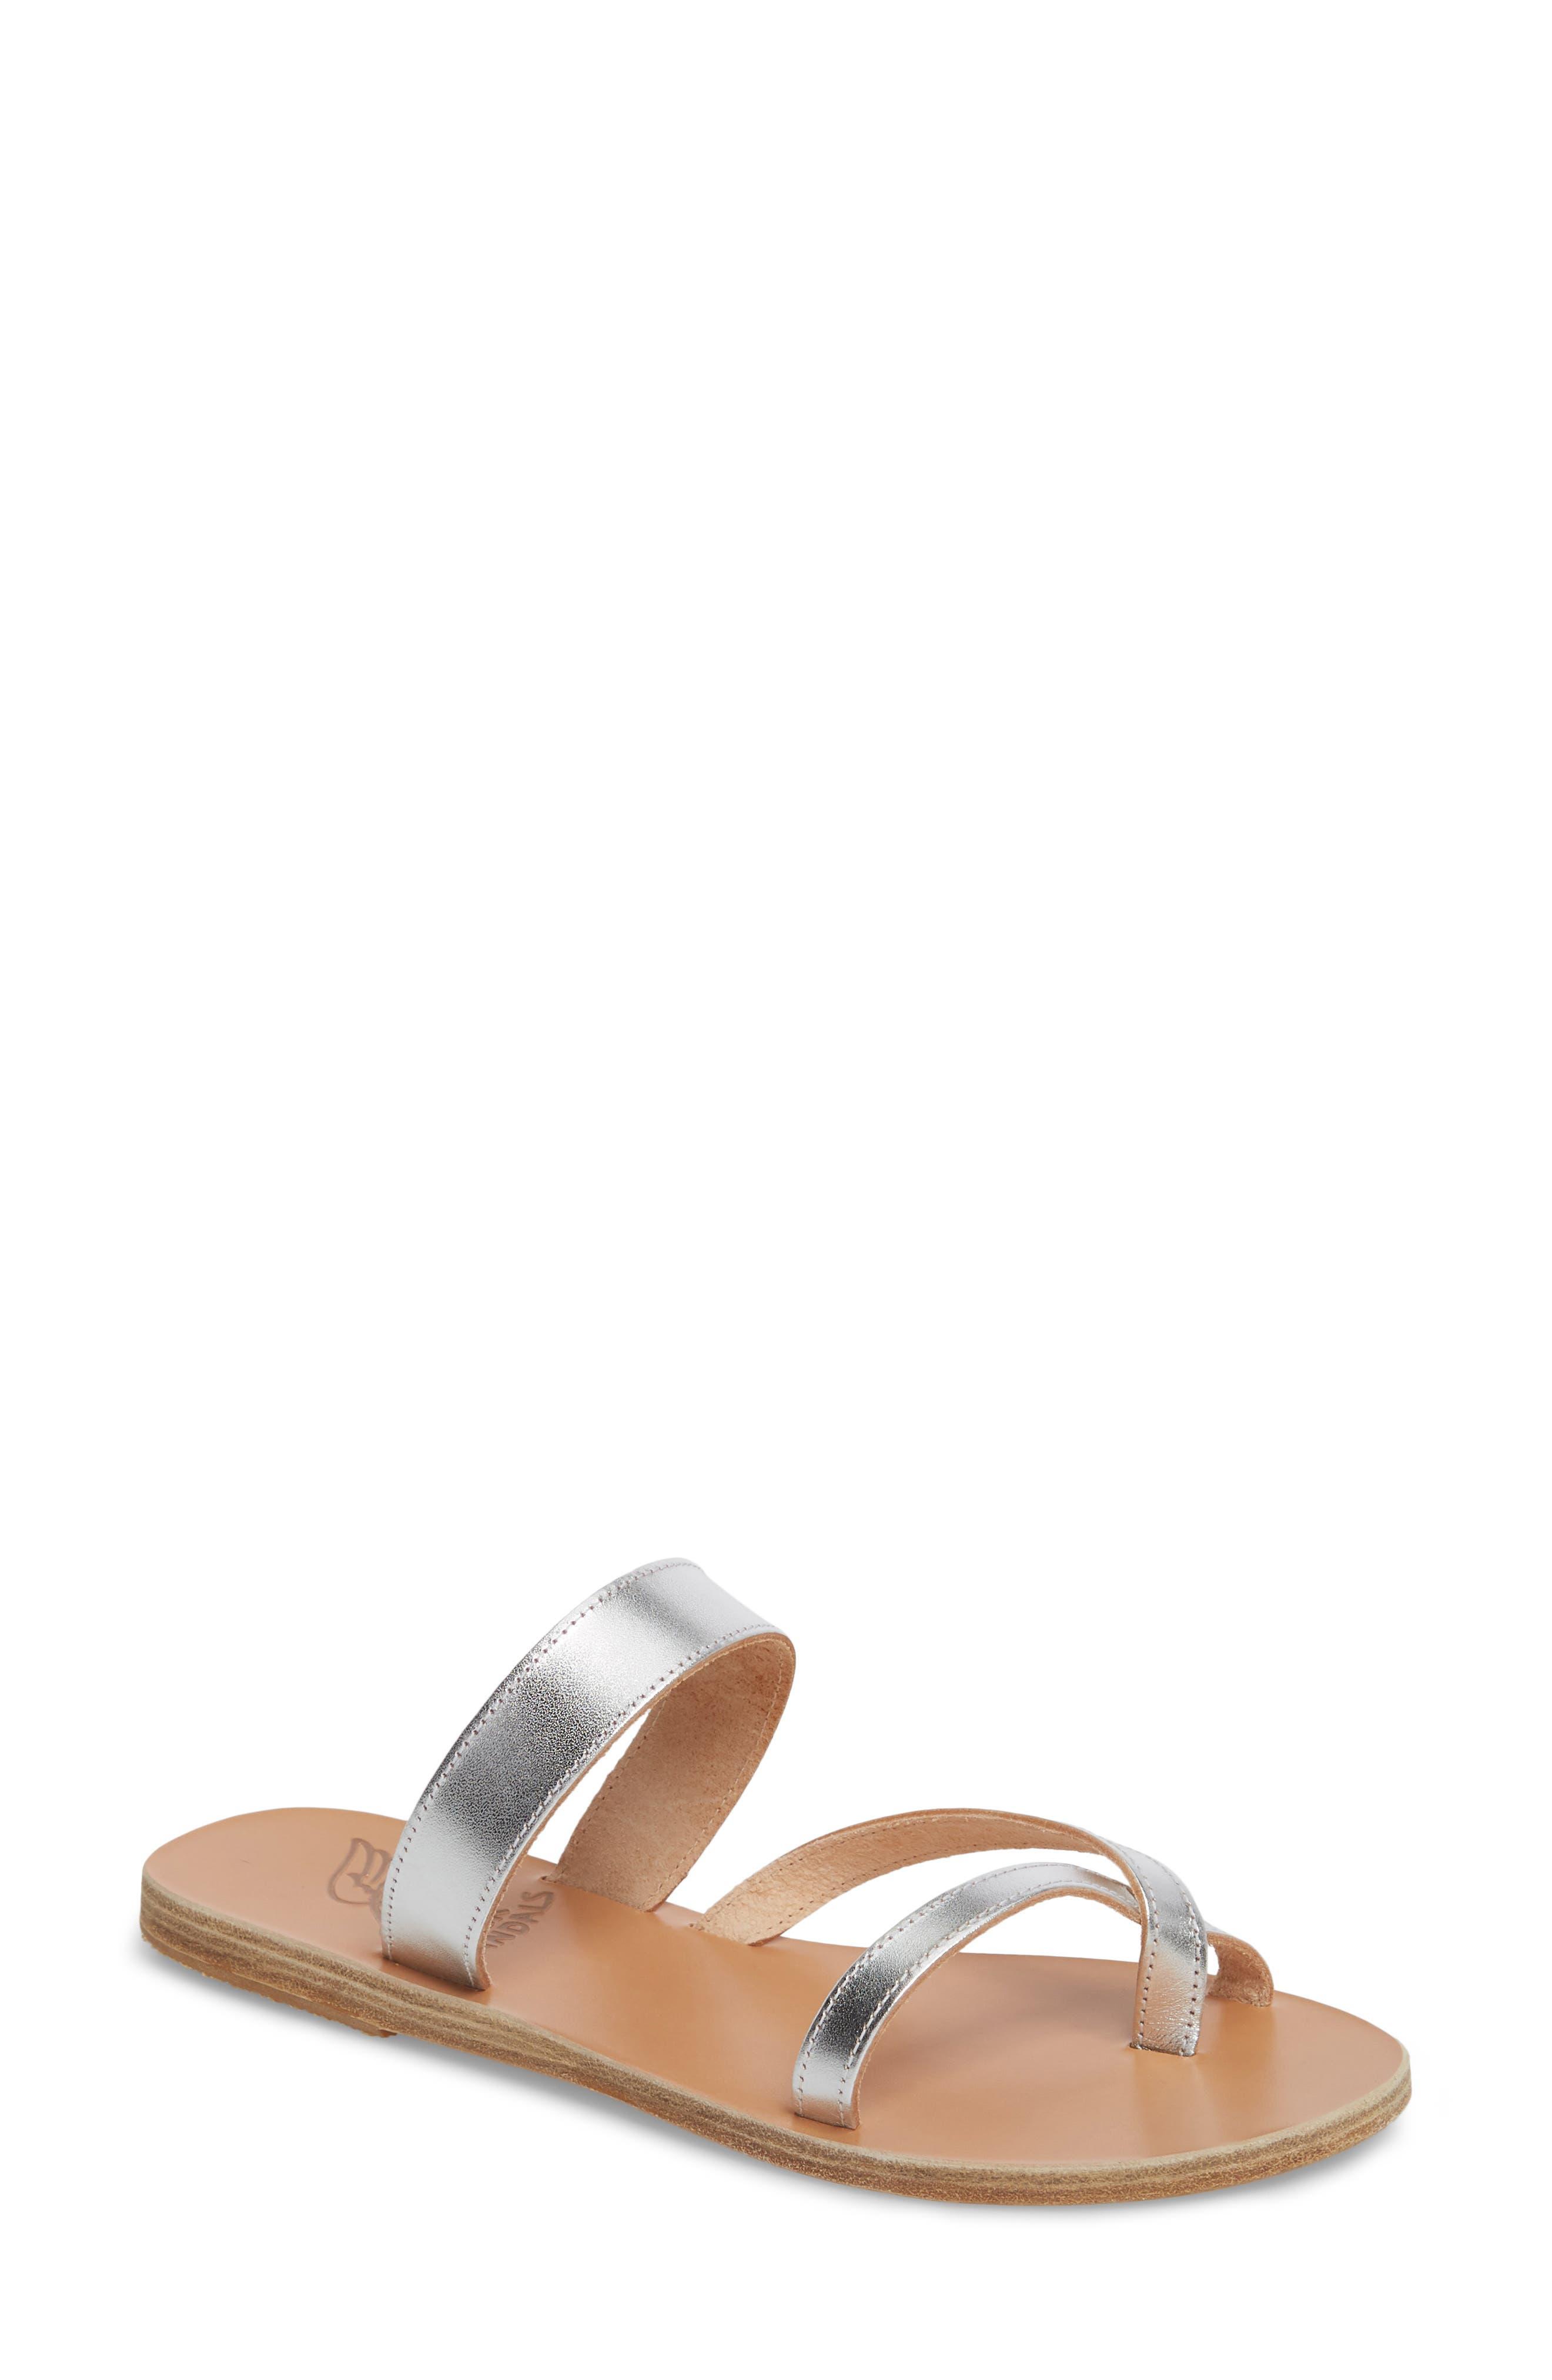 Ancient Greek Sandals Daphnae Sandal